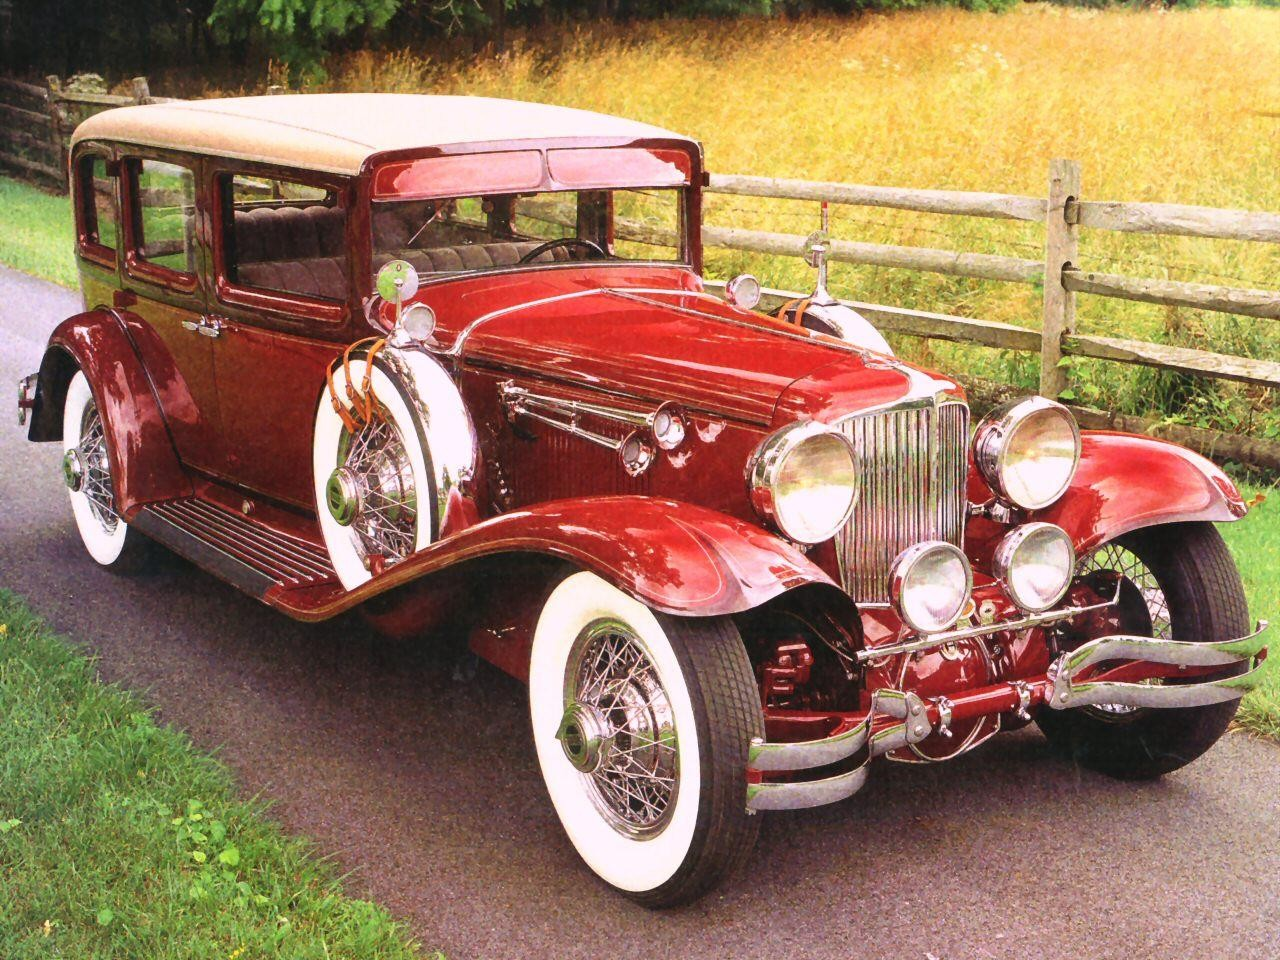 Old Classic Car Wallpaper High Quality Idiot Dollar 1280x960